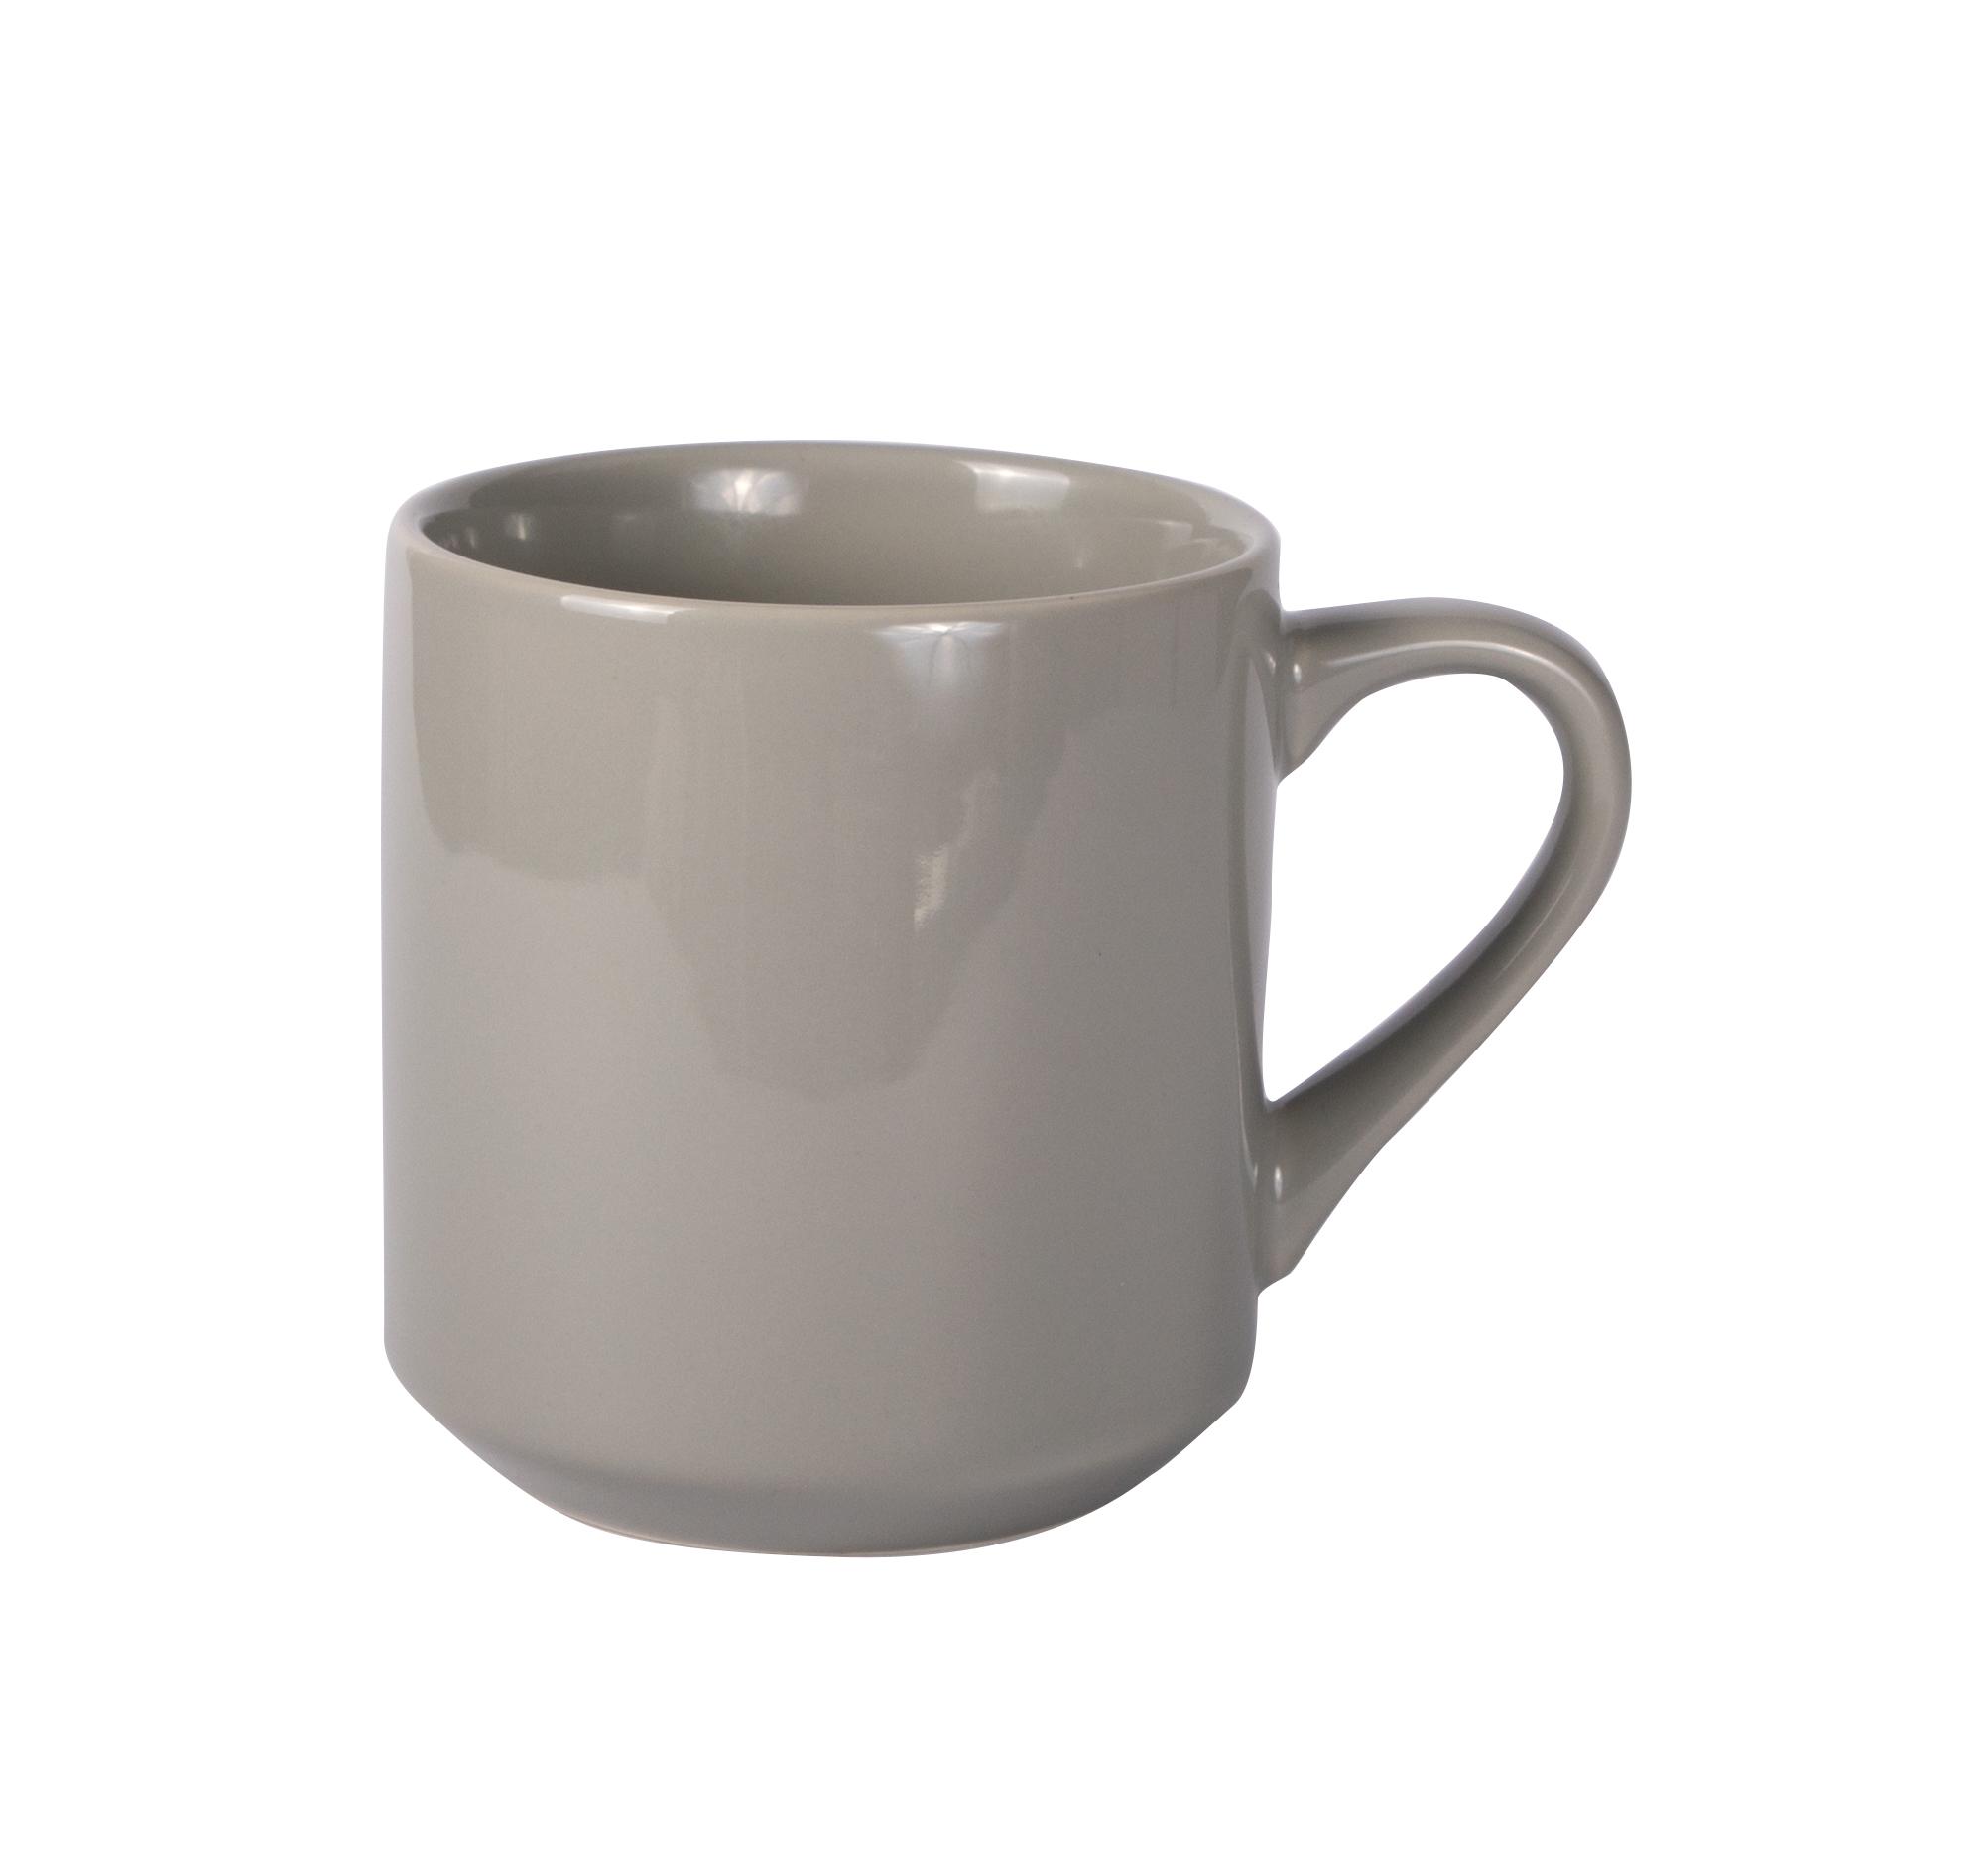 Kaffeebecher grau 340ml